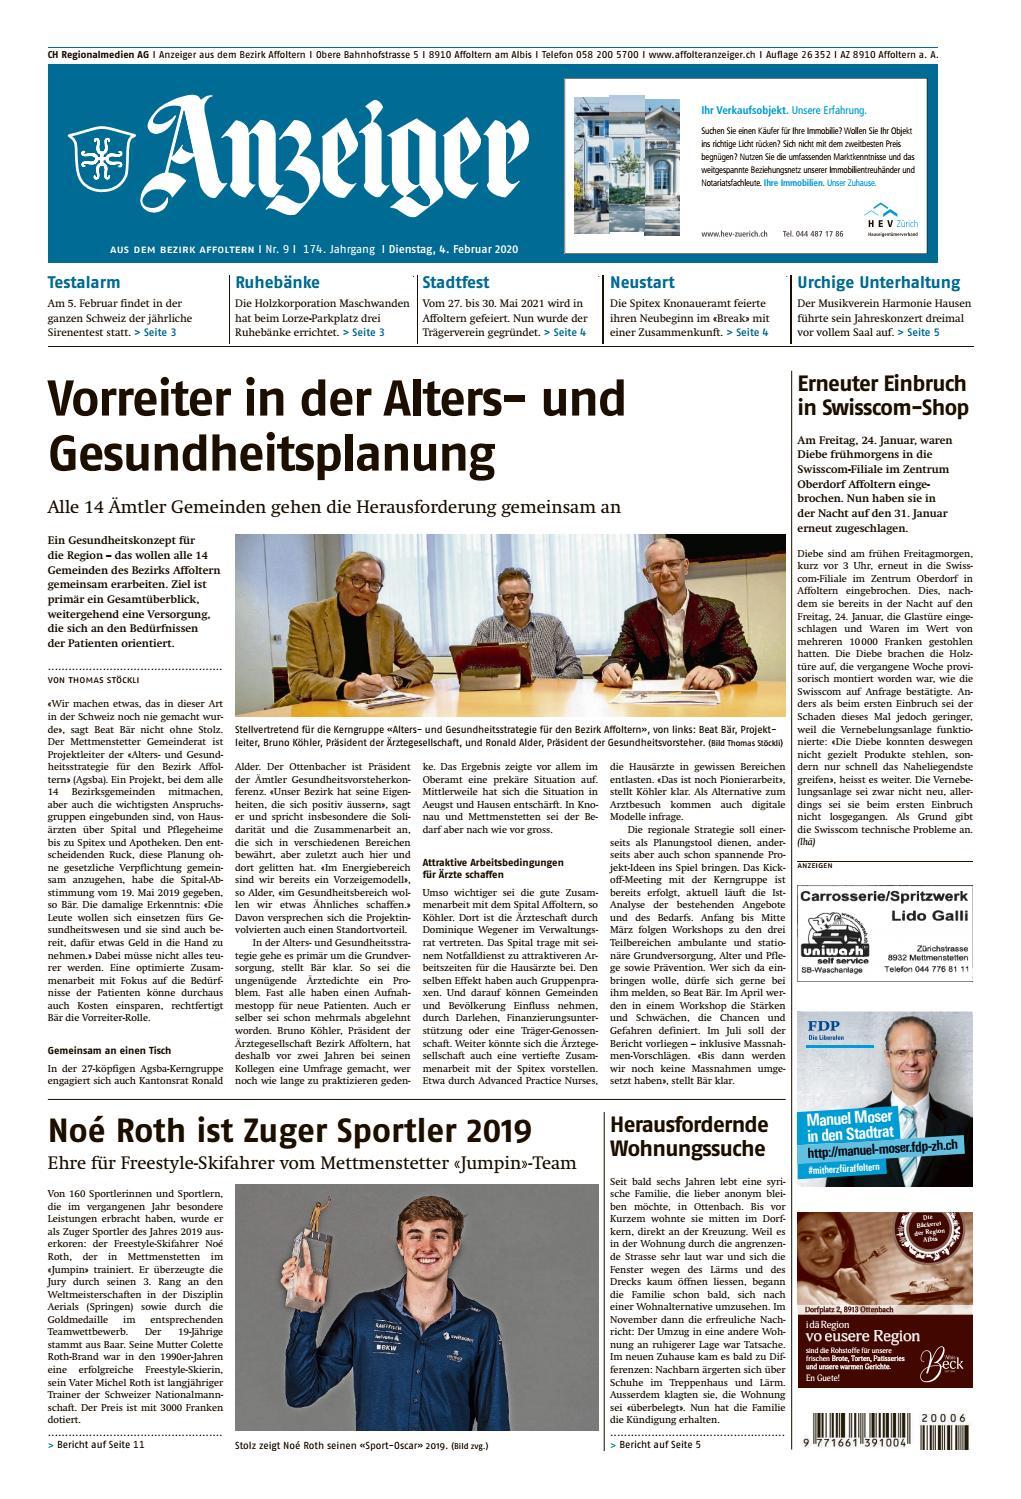 Wettswil aktiv 2/2018 - Gemeinde Wettswil